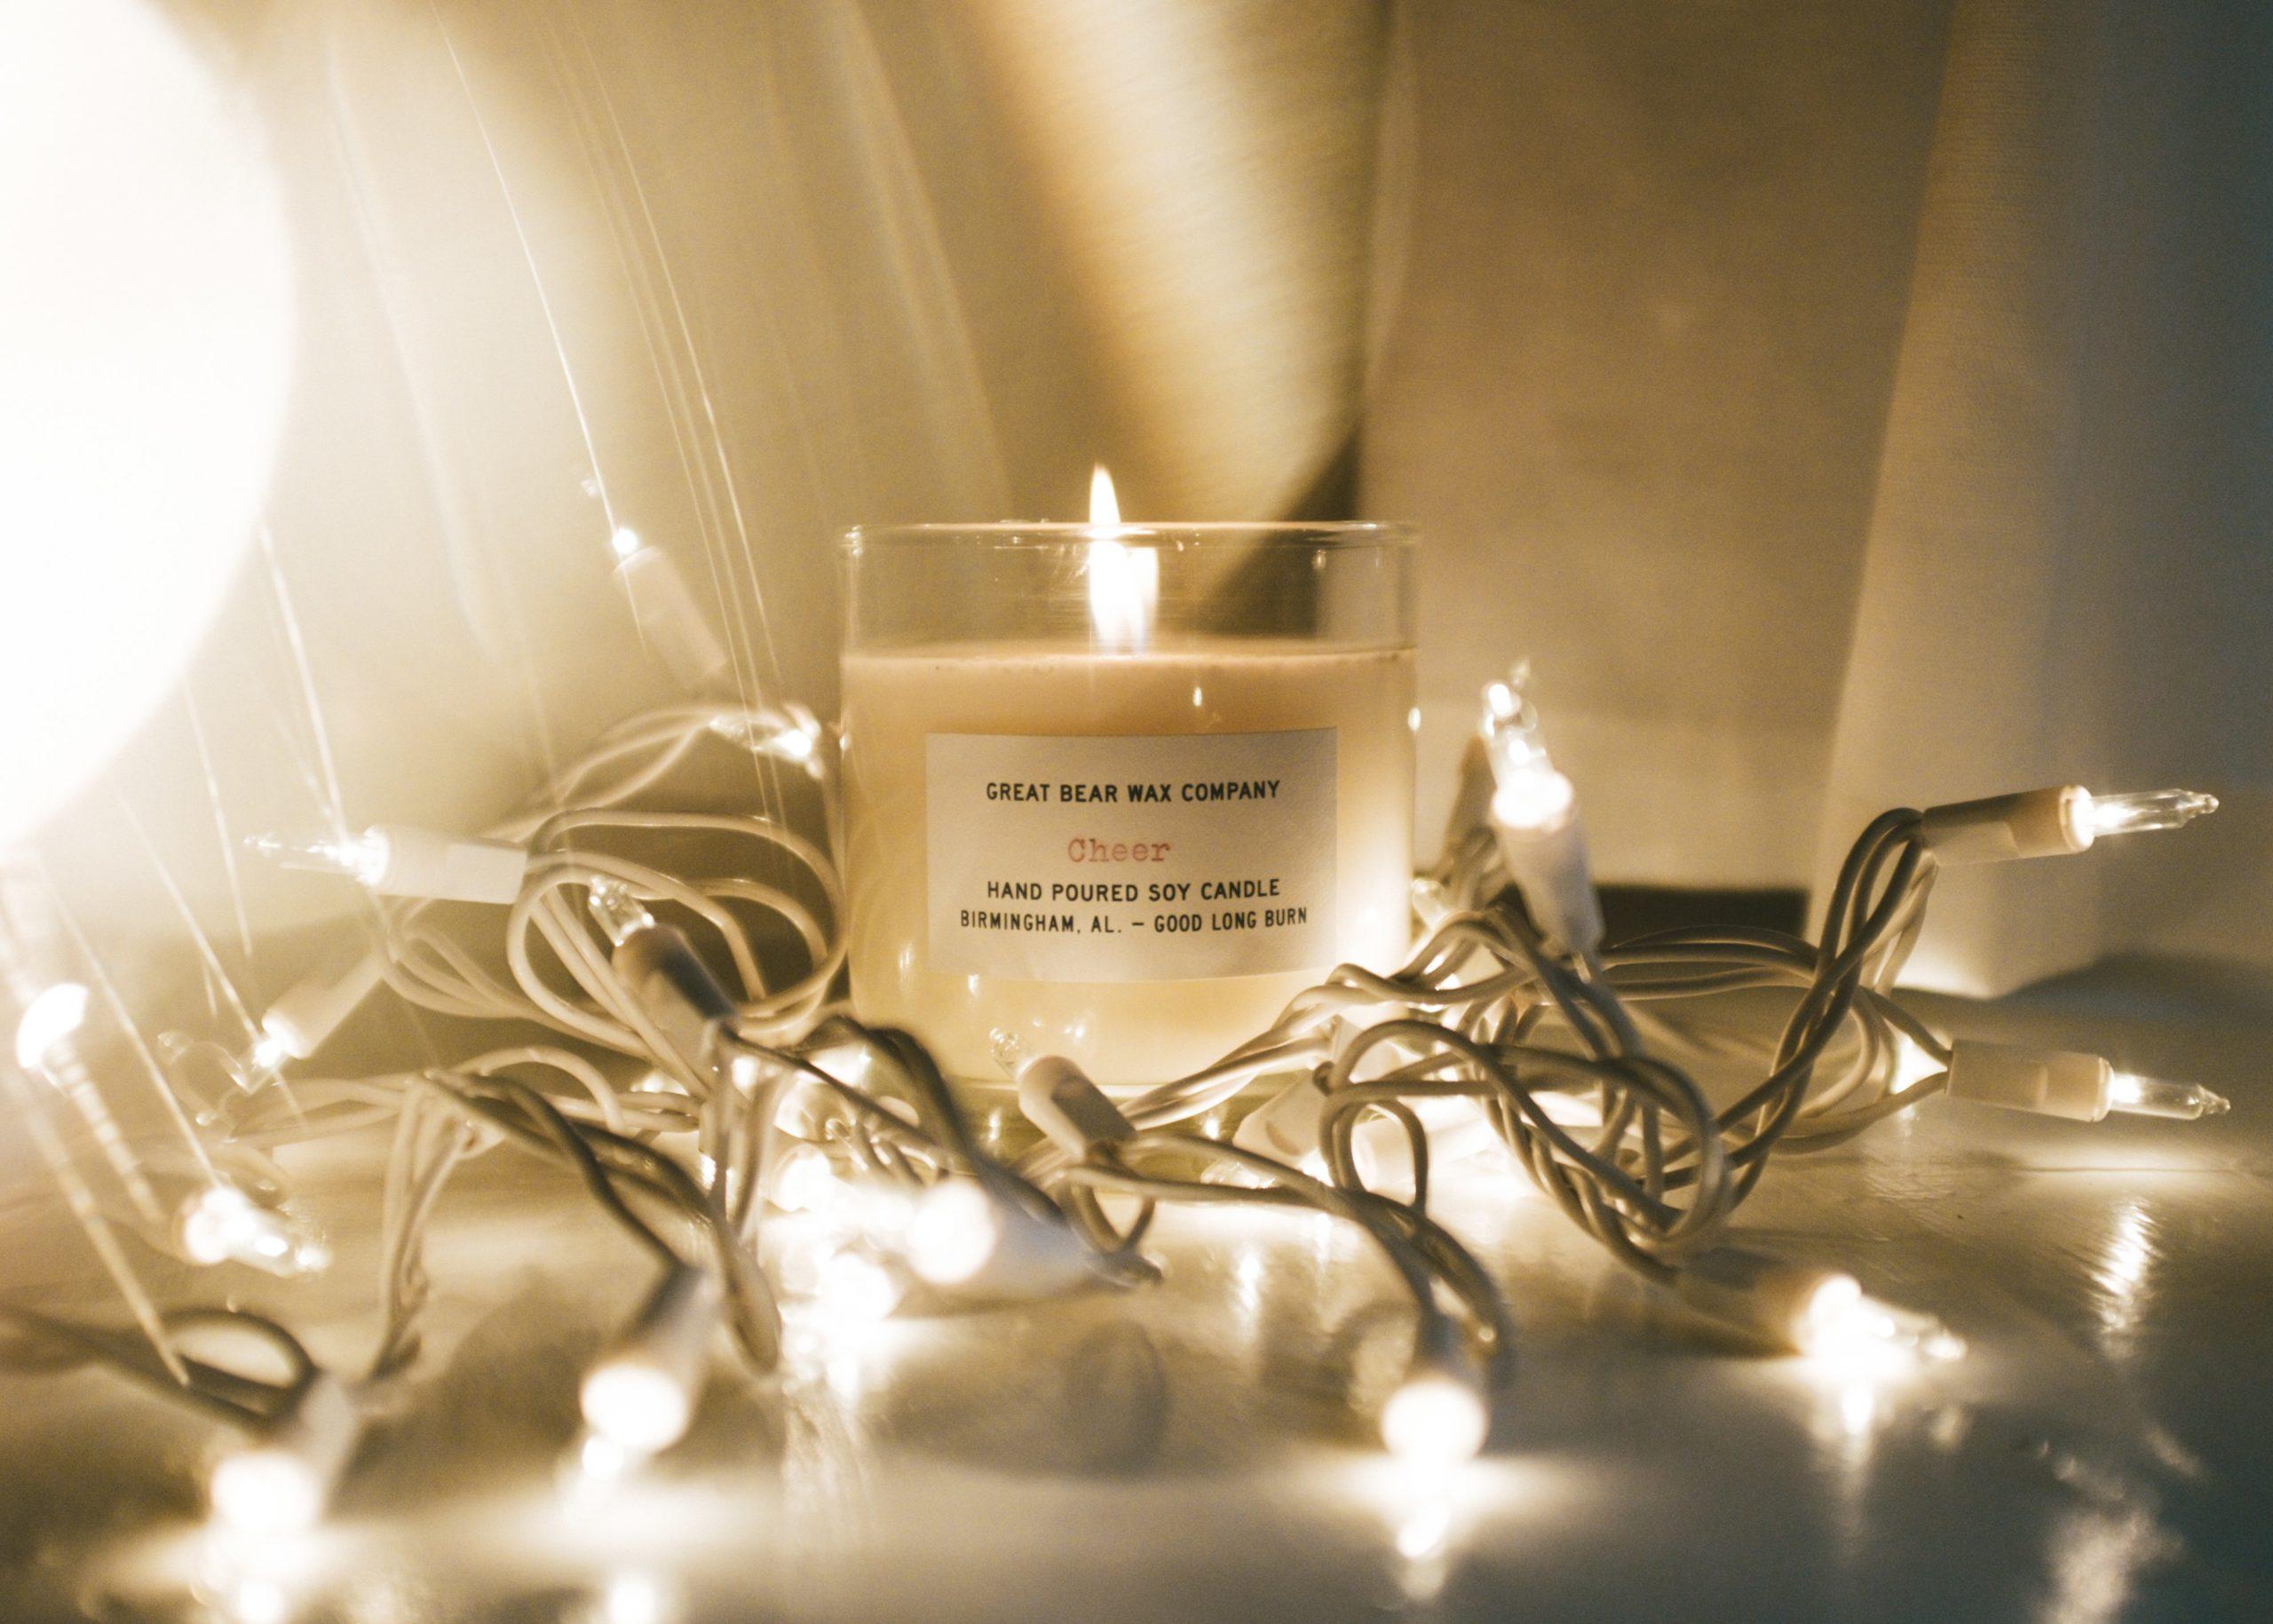 alabama-made candle